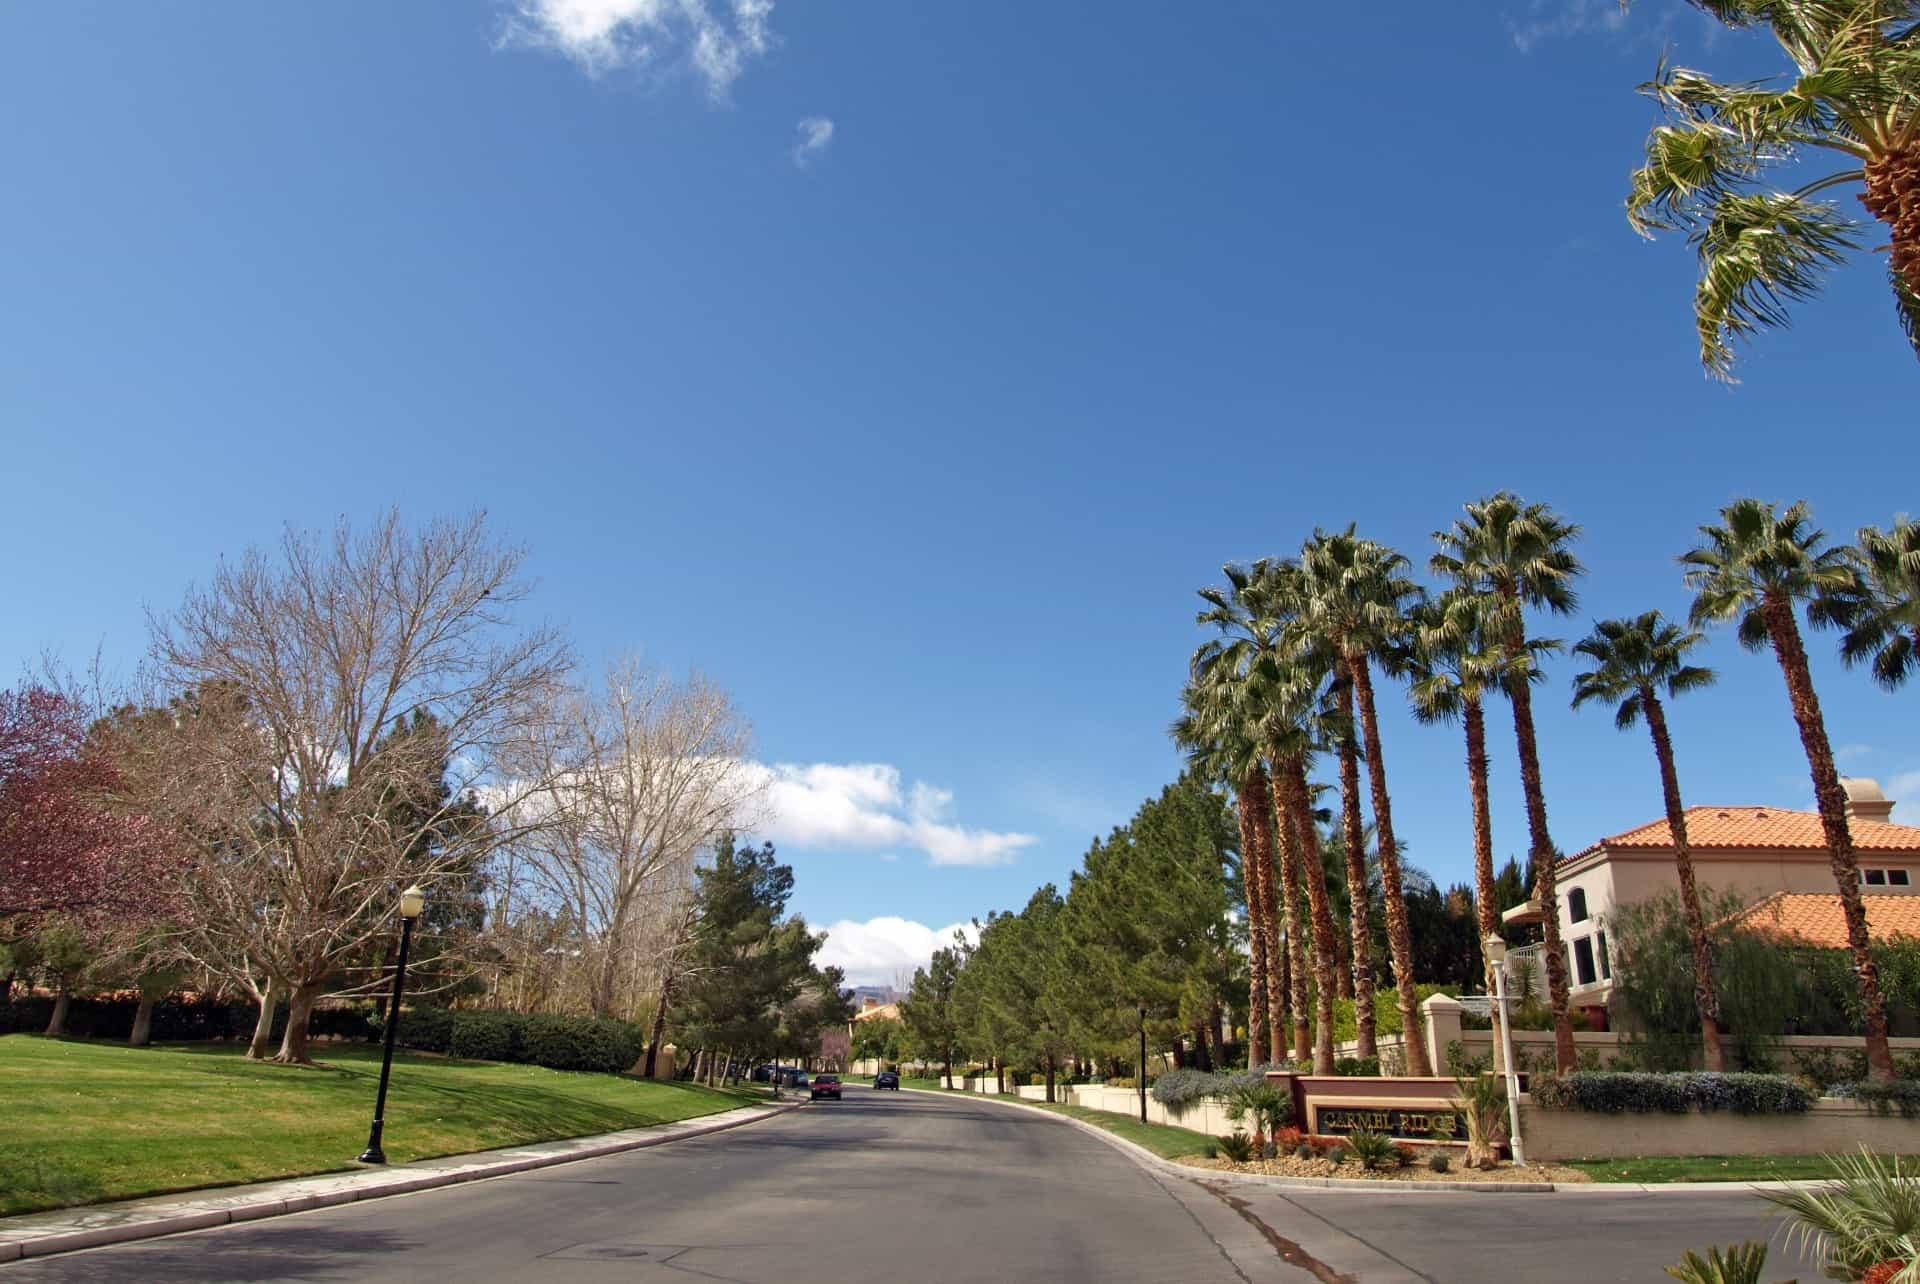 spanish-trail-rob-jensen-company-guard-gated-real-estate-summerlin-las-vegas-henderson-19